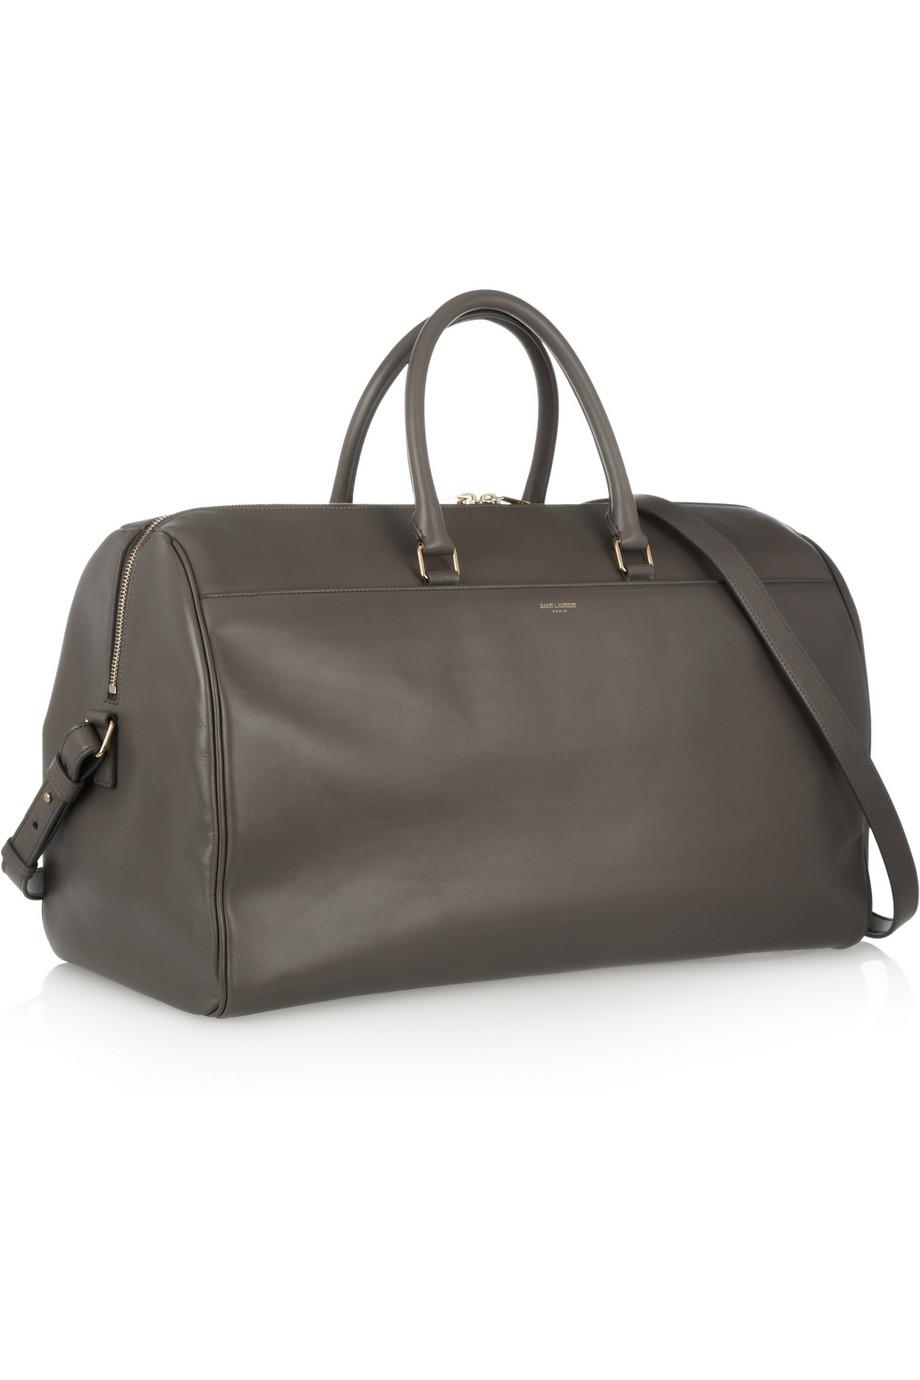 f3efba905e35 Saint Laurent Classic Duffle 24 Leather Bag in Gray - Lyst